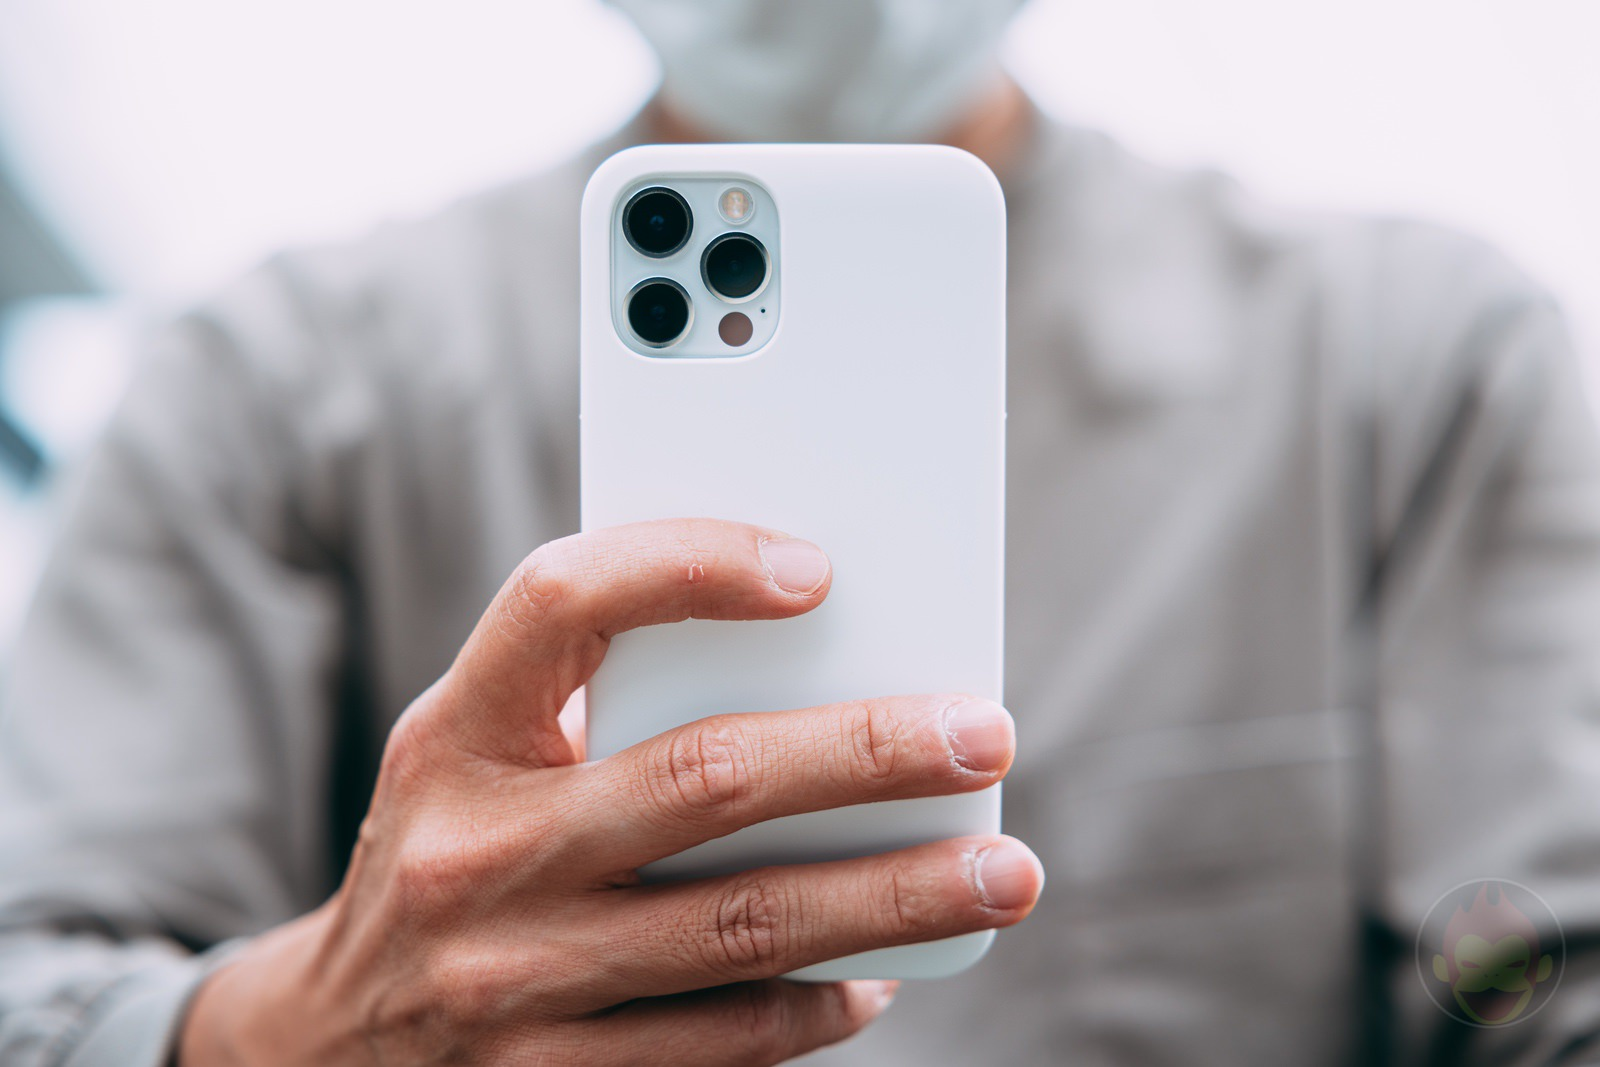 MYNUS-iPhone-12-Pro-Case-Review-13.jpg